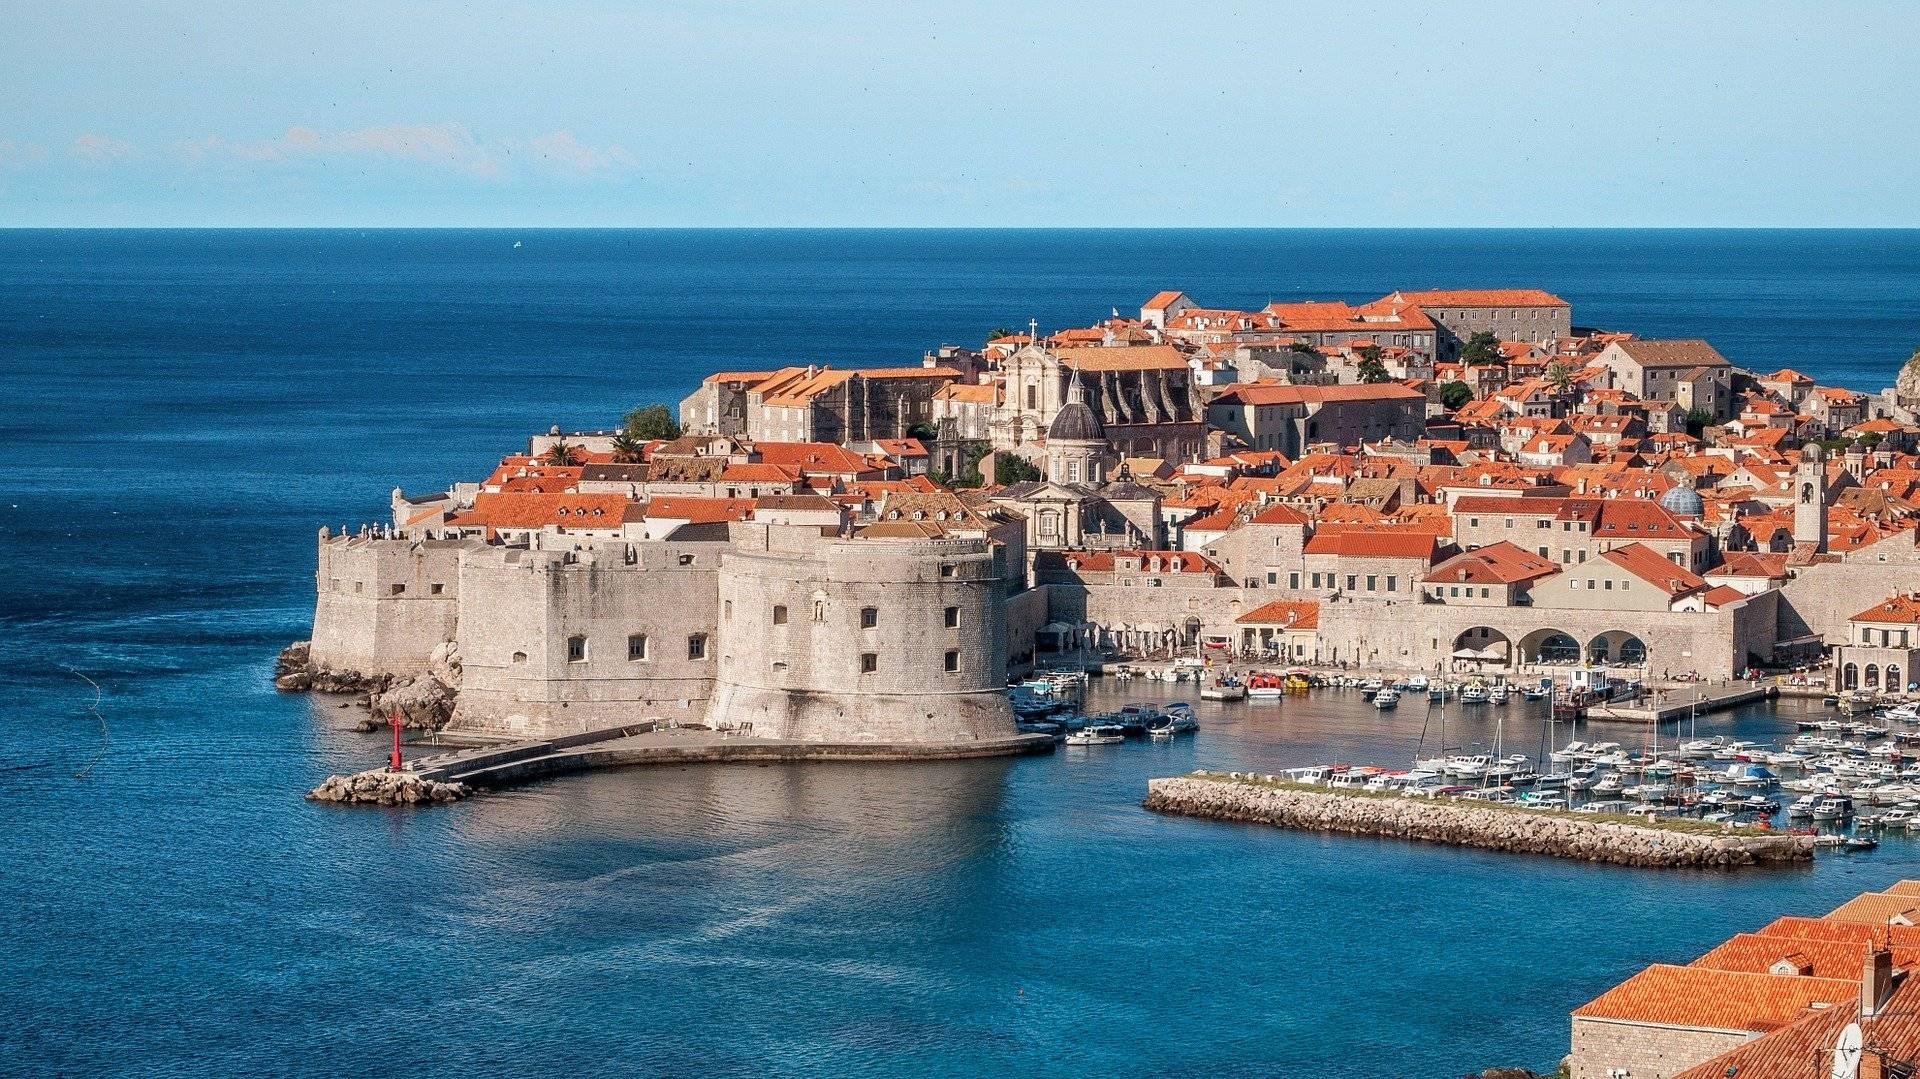 Location de voiture  Dubrovnik